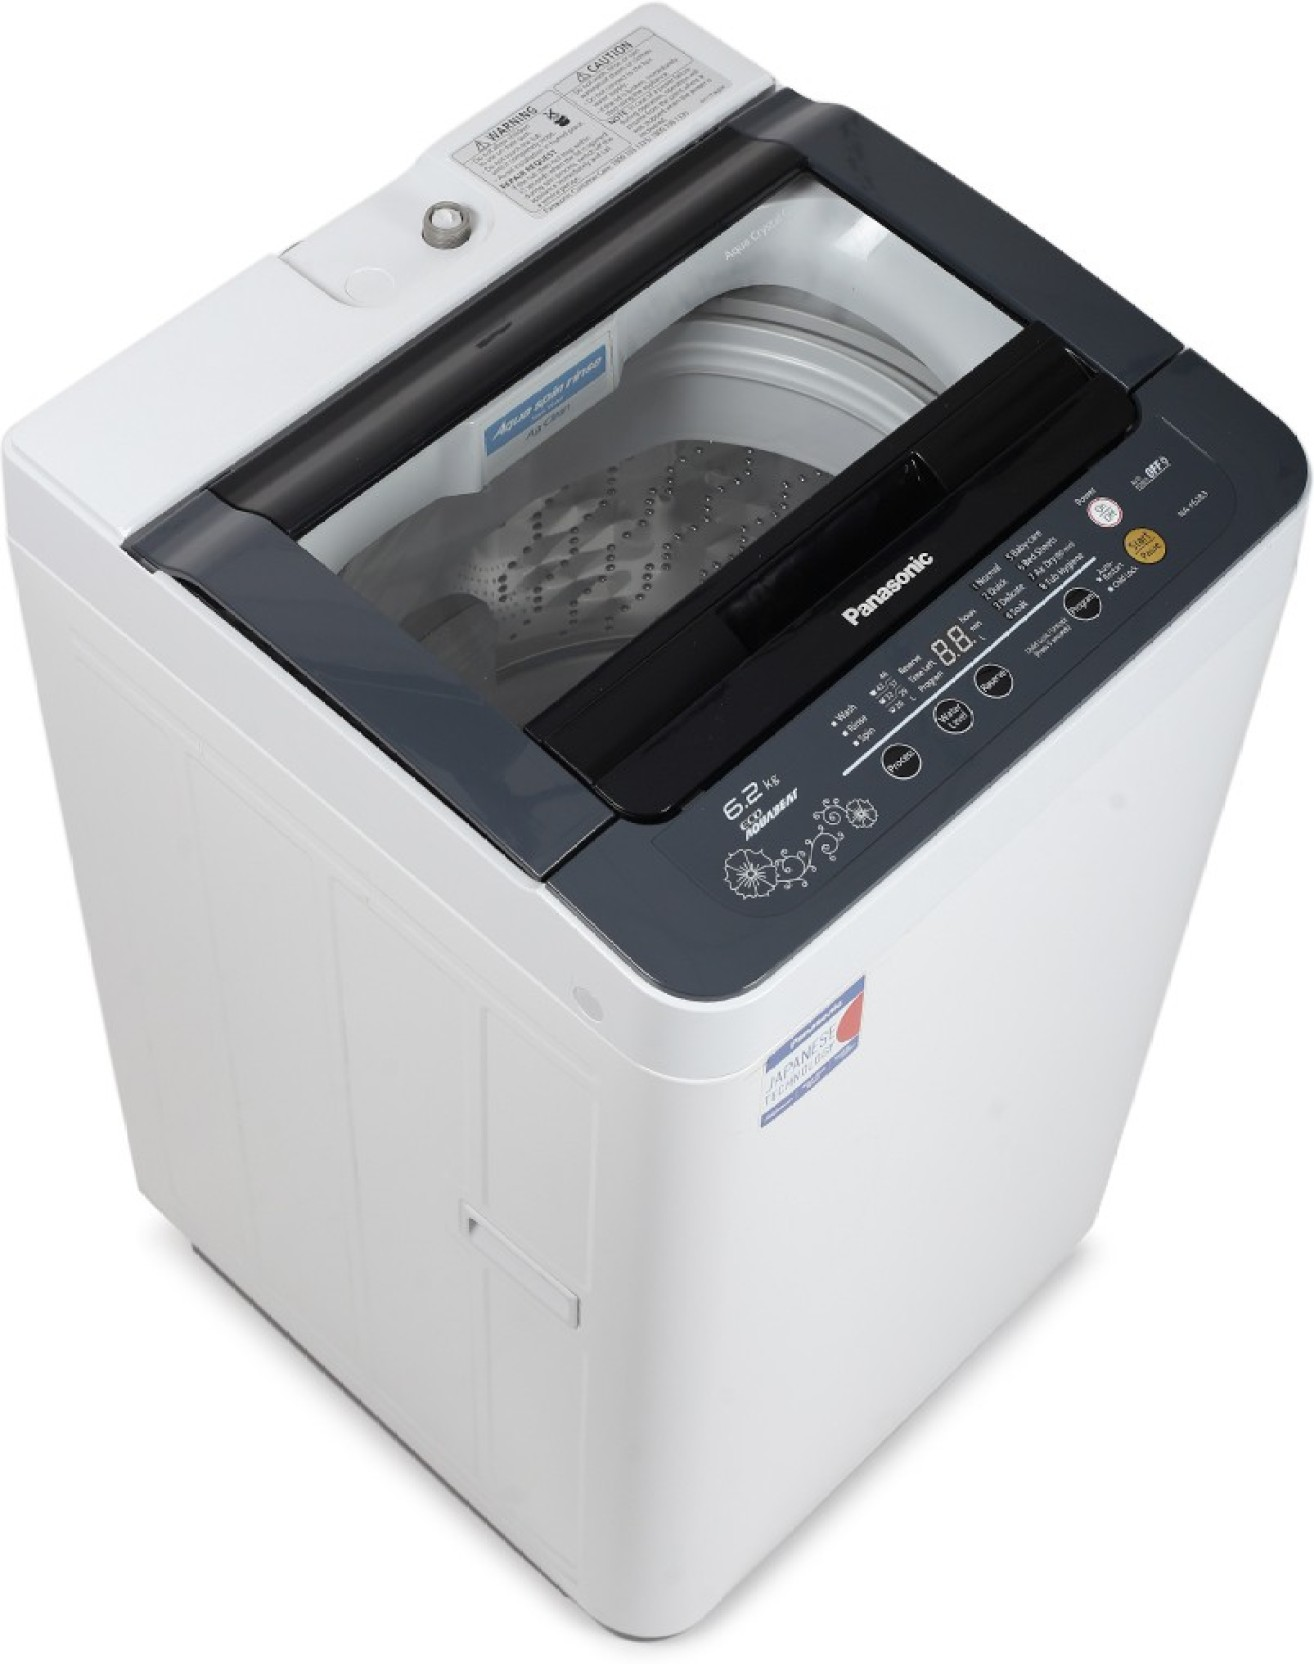 Panasonic 6 2 Kg Fully Automatic Top Load Washing Machine